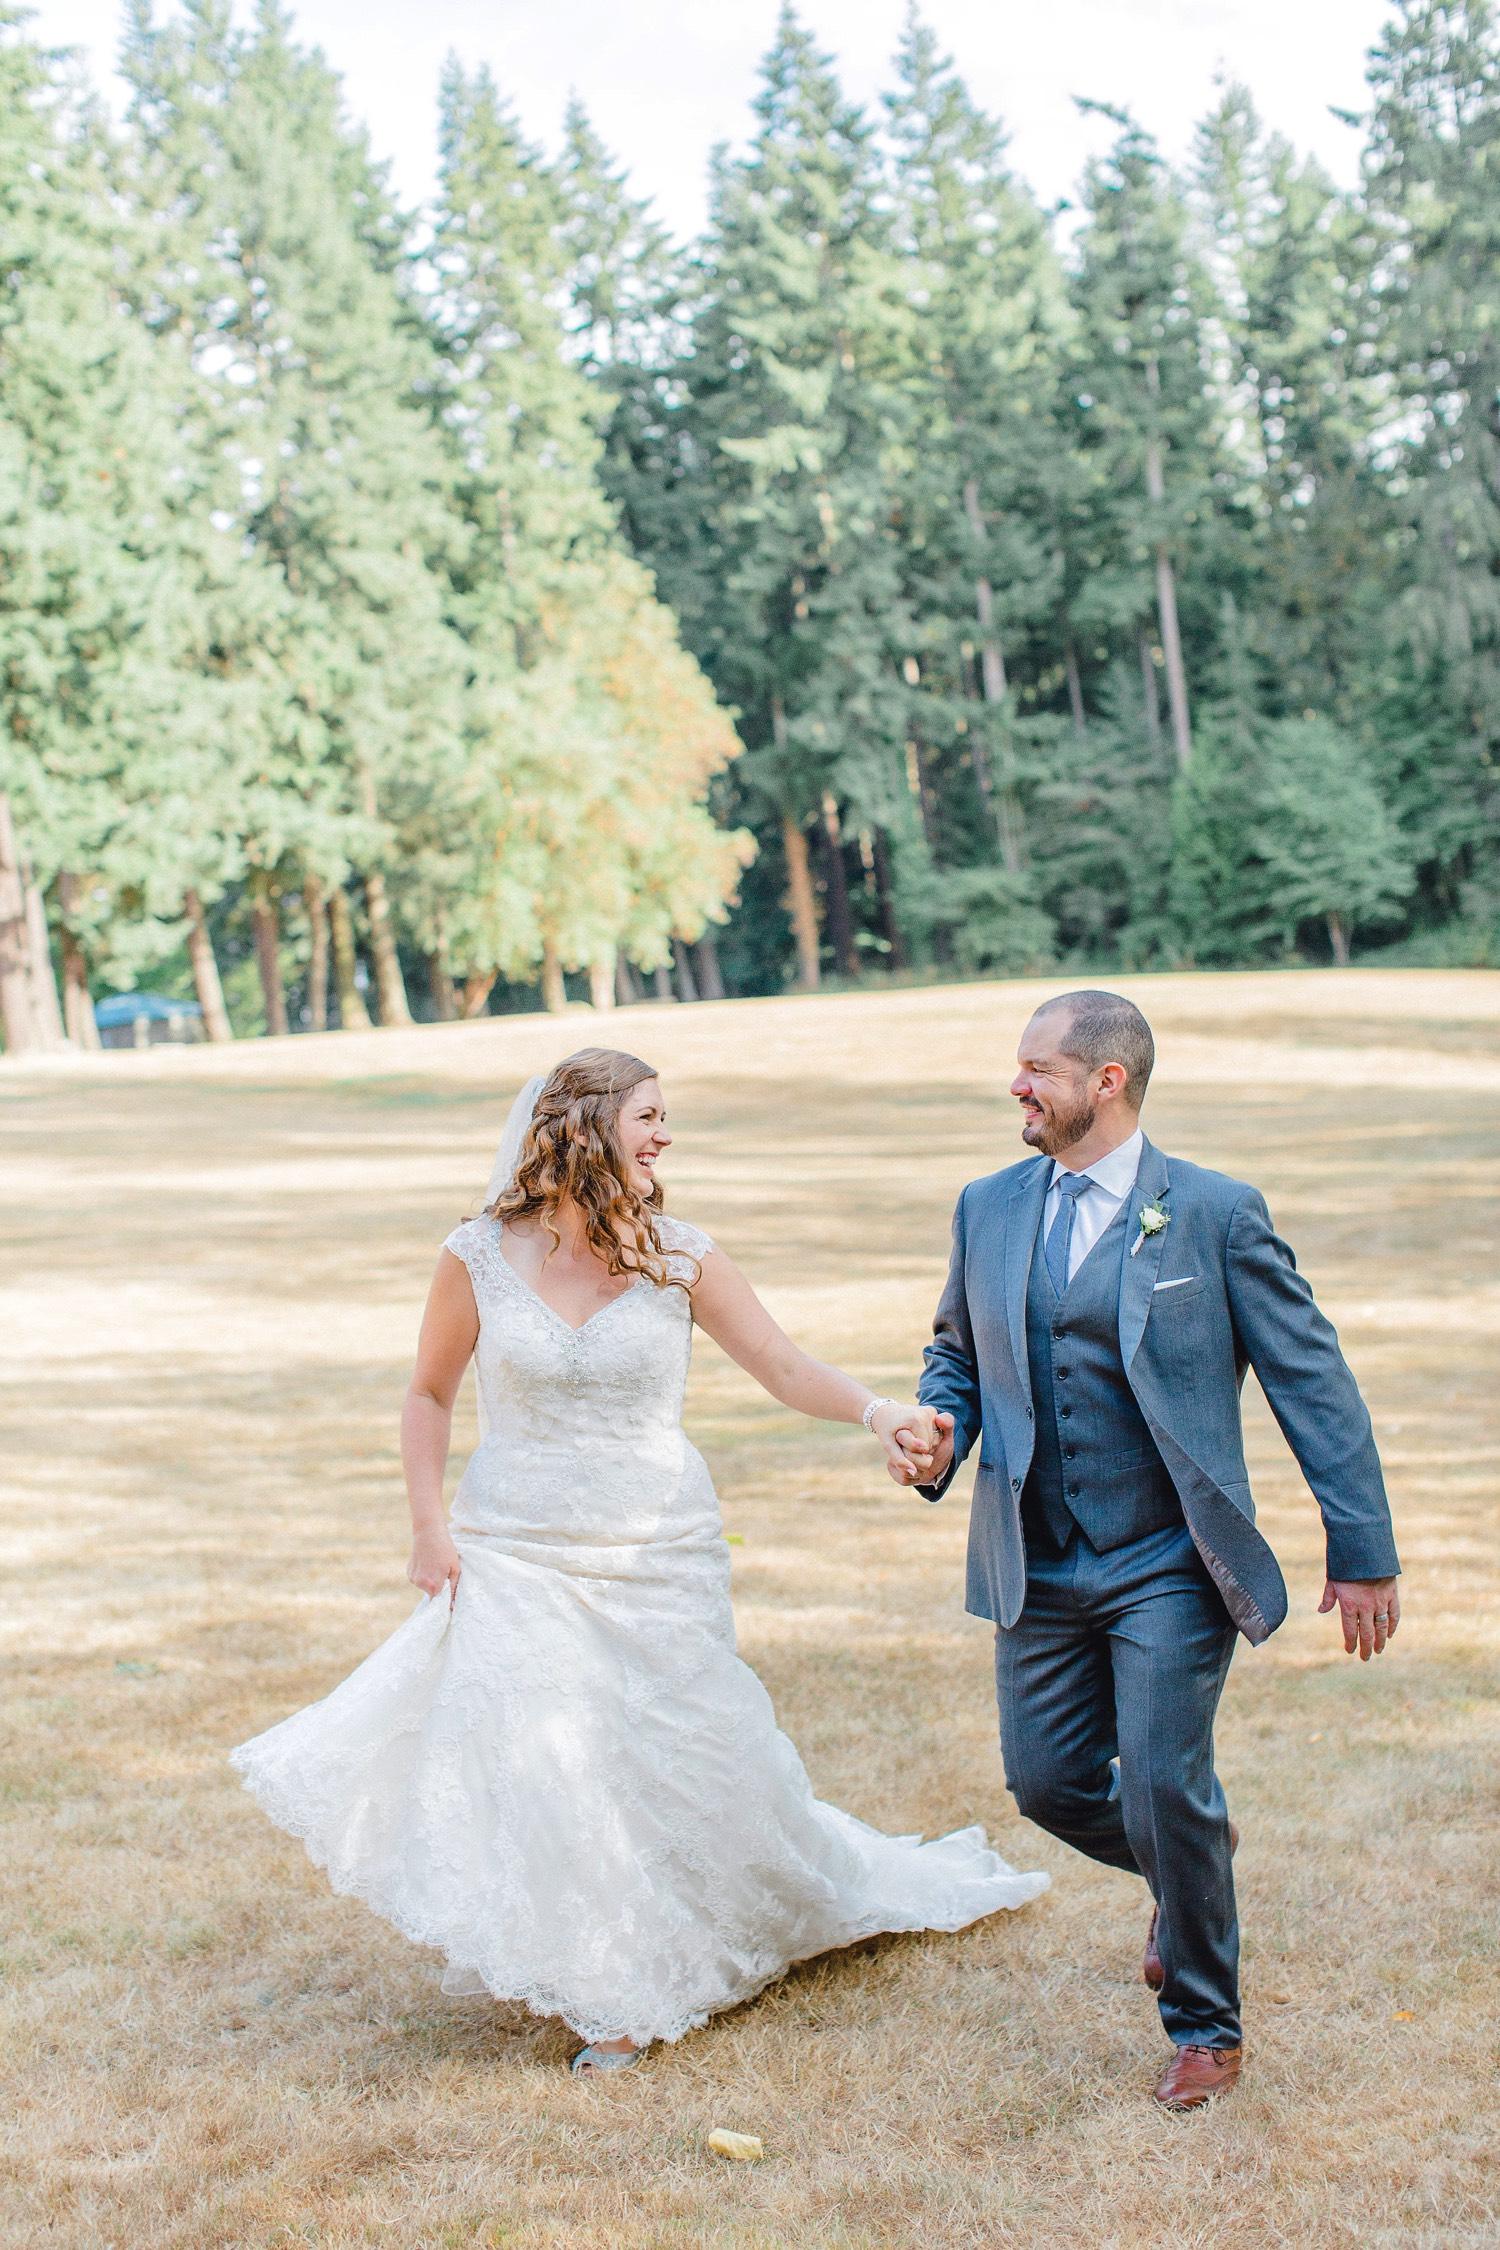 0000000000076_emmarosecompany_katiematt-9915_Photographer_PNW_House_Robinswood_Emma_Light_Company_Airy_Rose_and_Wedding_Seattle.jpg